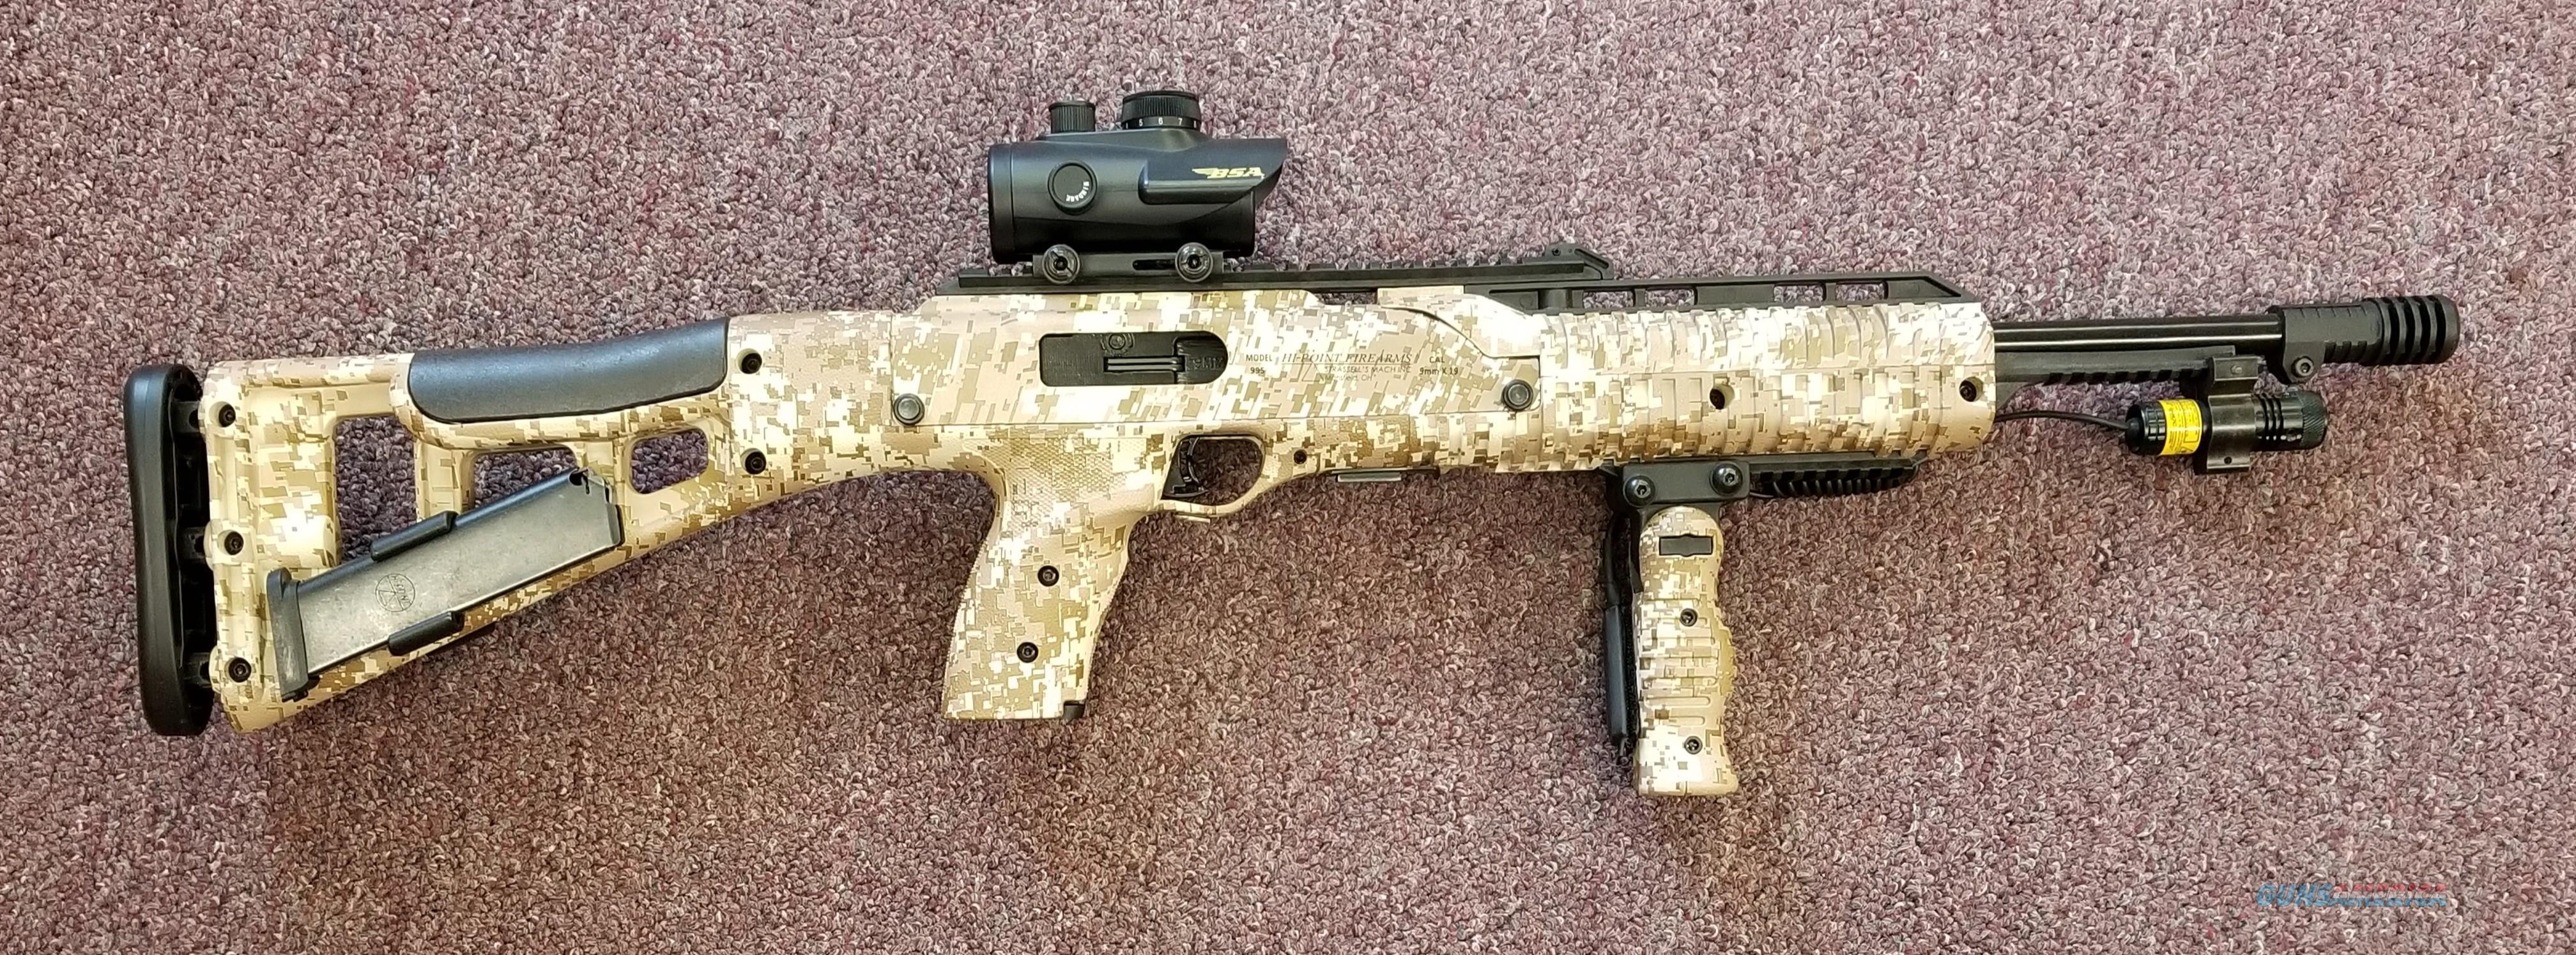 Hi-Point 995 Desert Digital Camo 9mm Tactical Carbine - Free Shipping !  Guns > Rifles > Hi Point Rifles